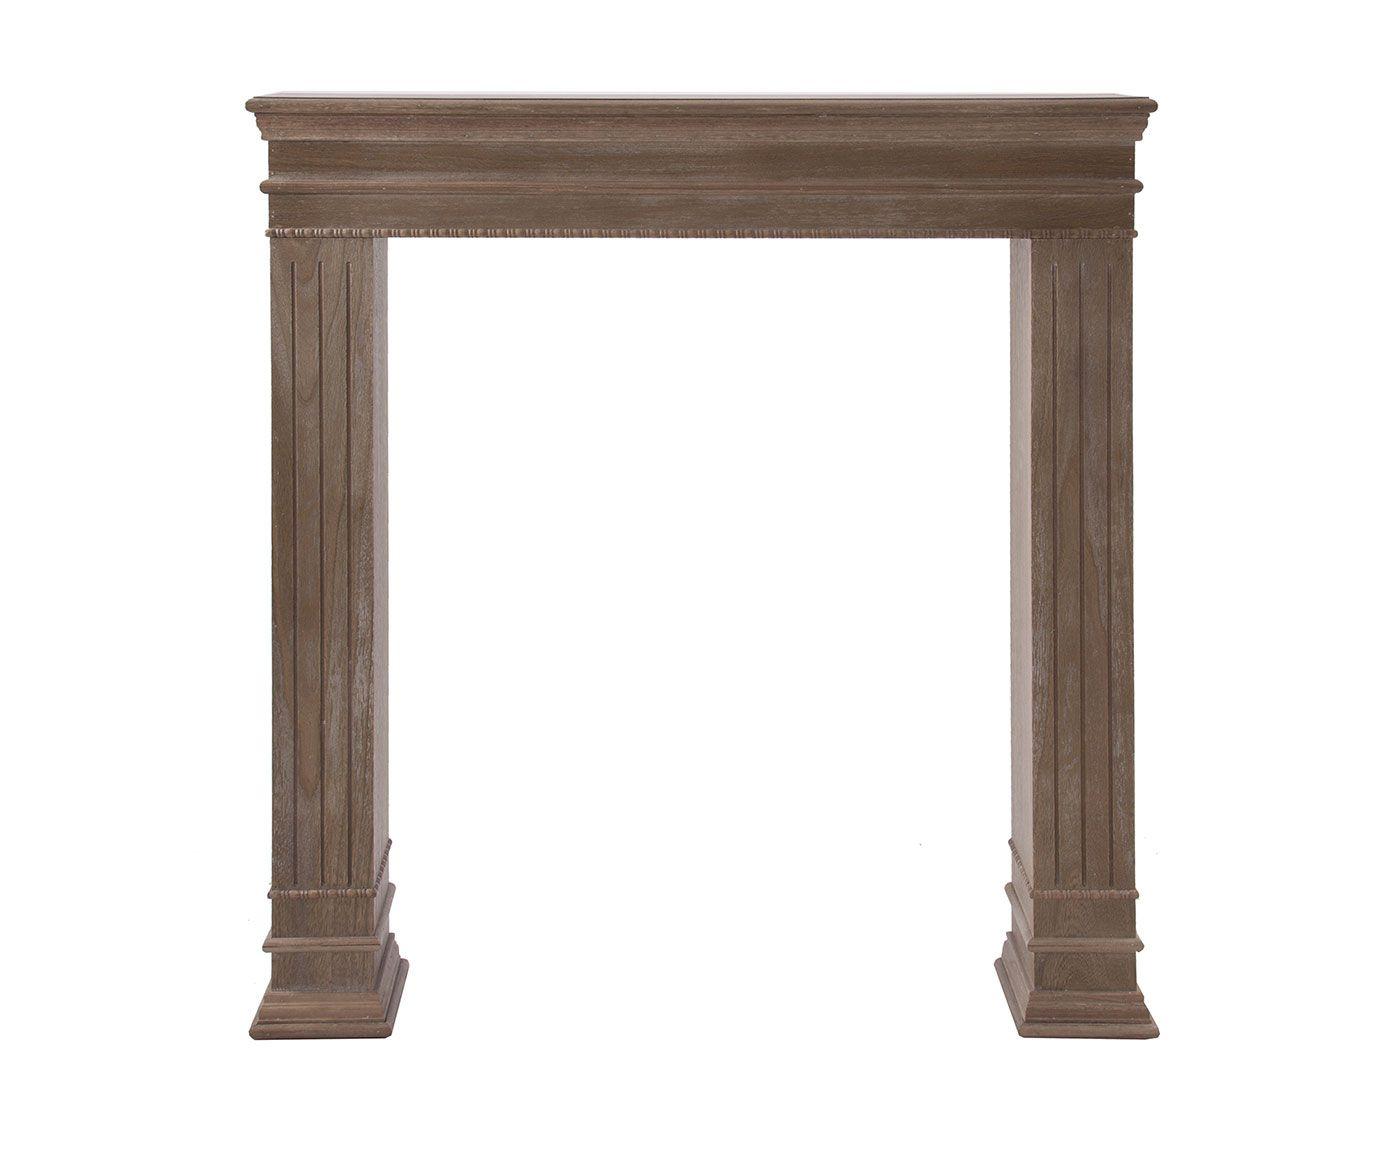 marco embellecedor para chimeneas de madera de paulonia westwing